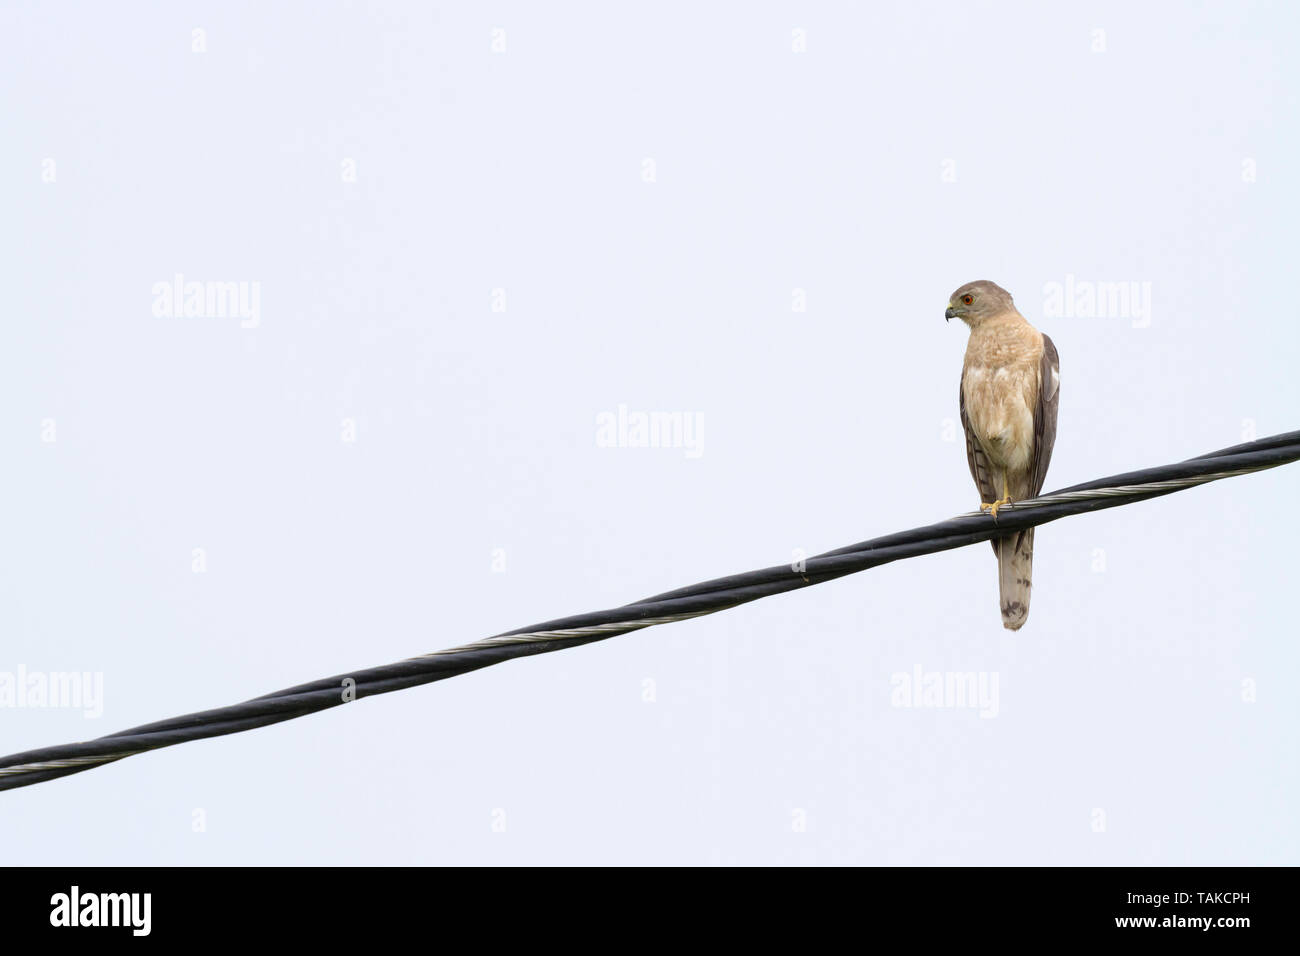 Shikra (Accipiter badius) perched on wire. Keoladeo National Park. Bharatpur. Rajasthan. India. - Stock Image